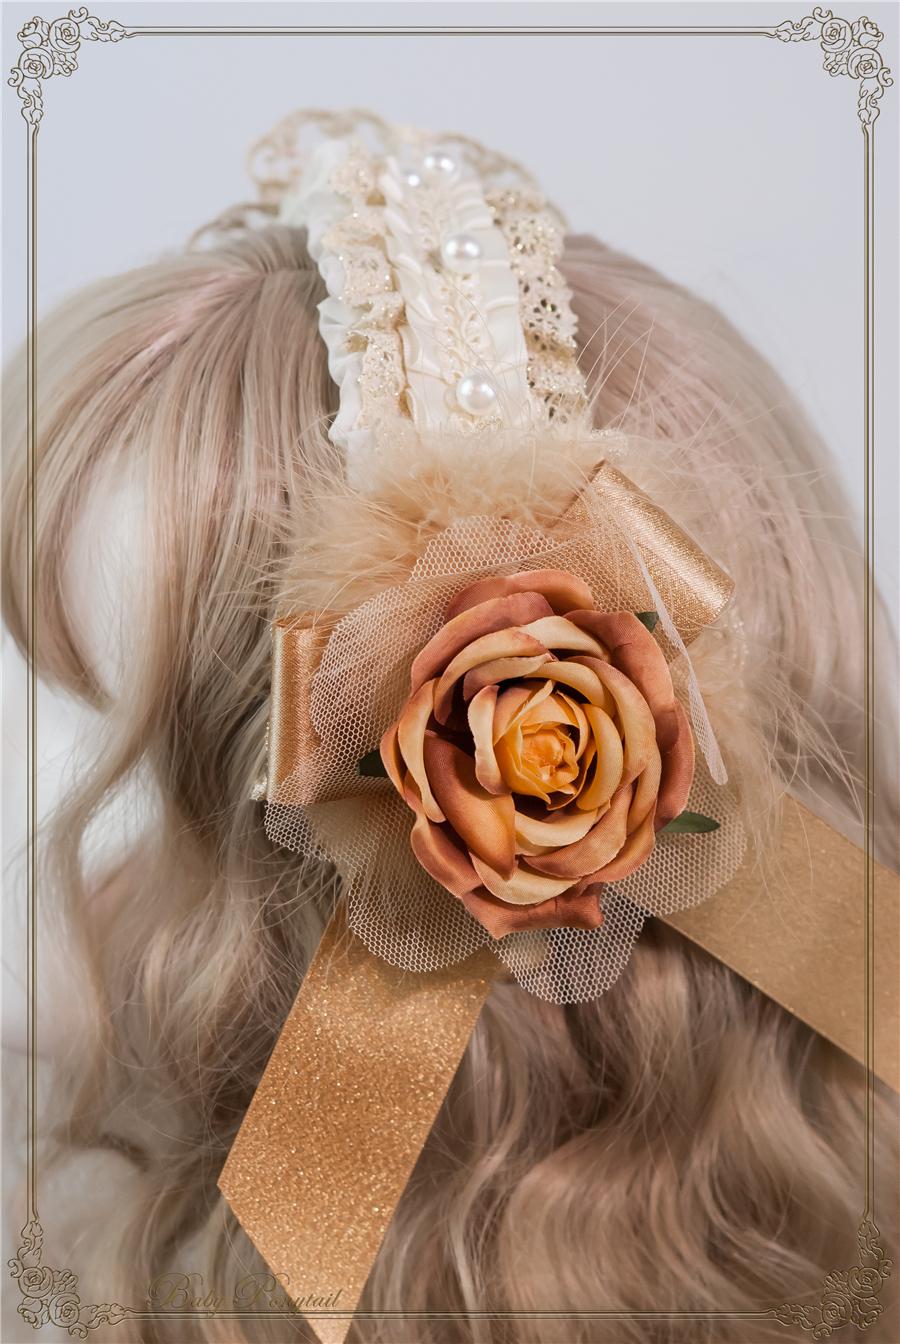 Baby Ponytail_Stock photo_Circus Princess_Rose Head Dress Golden_02.jpg